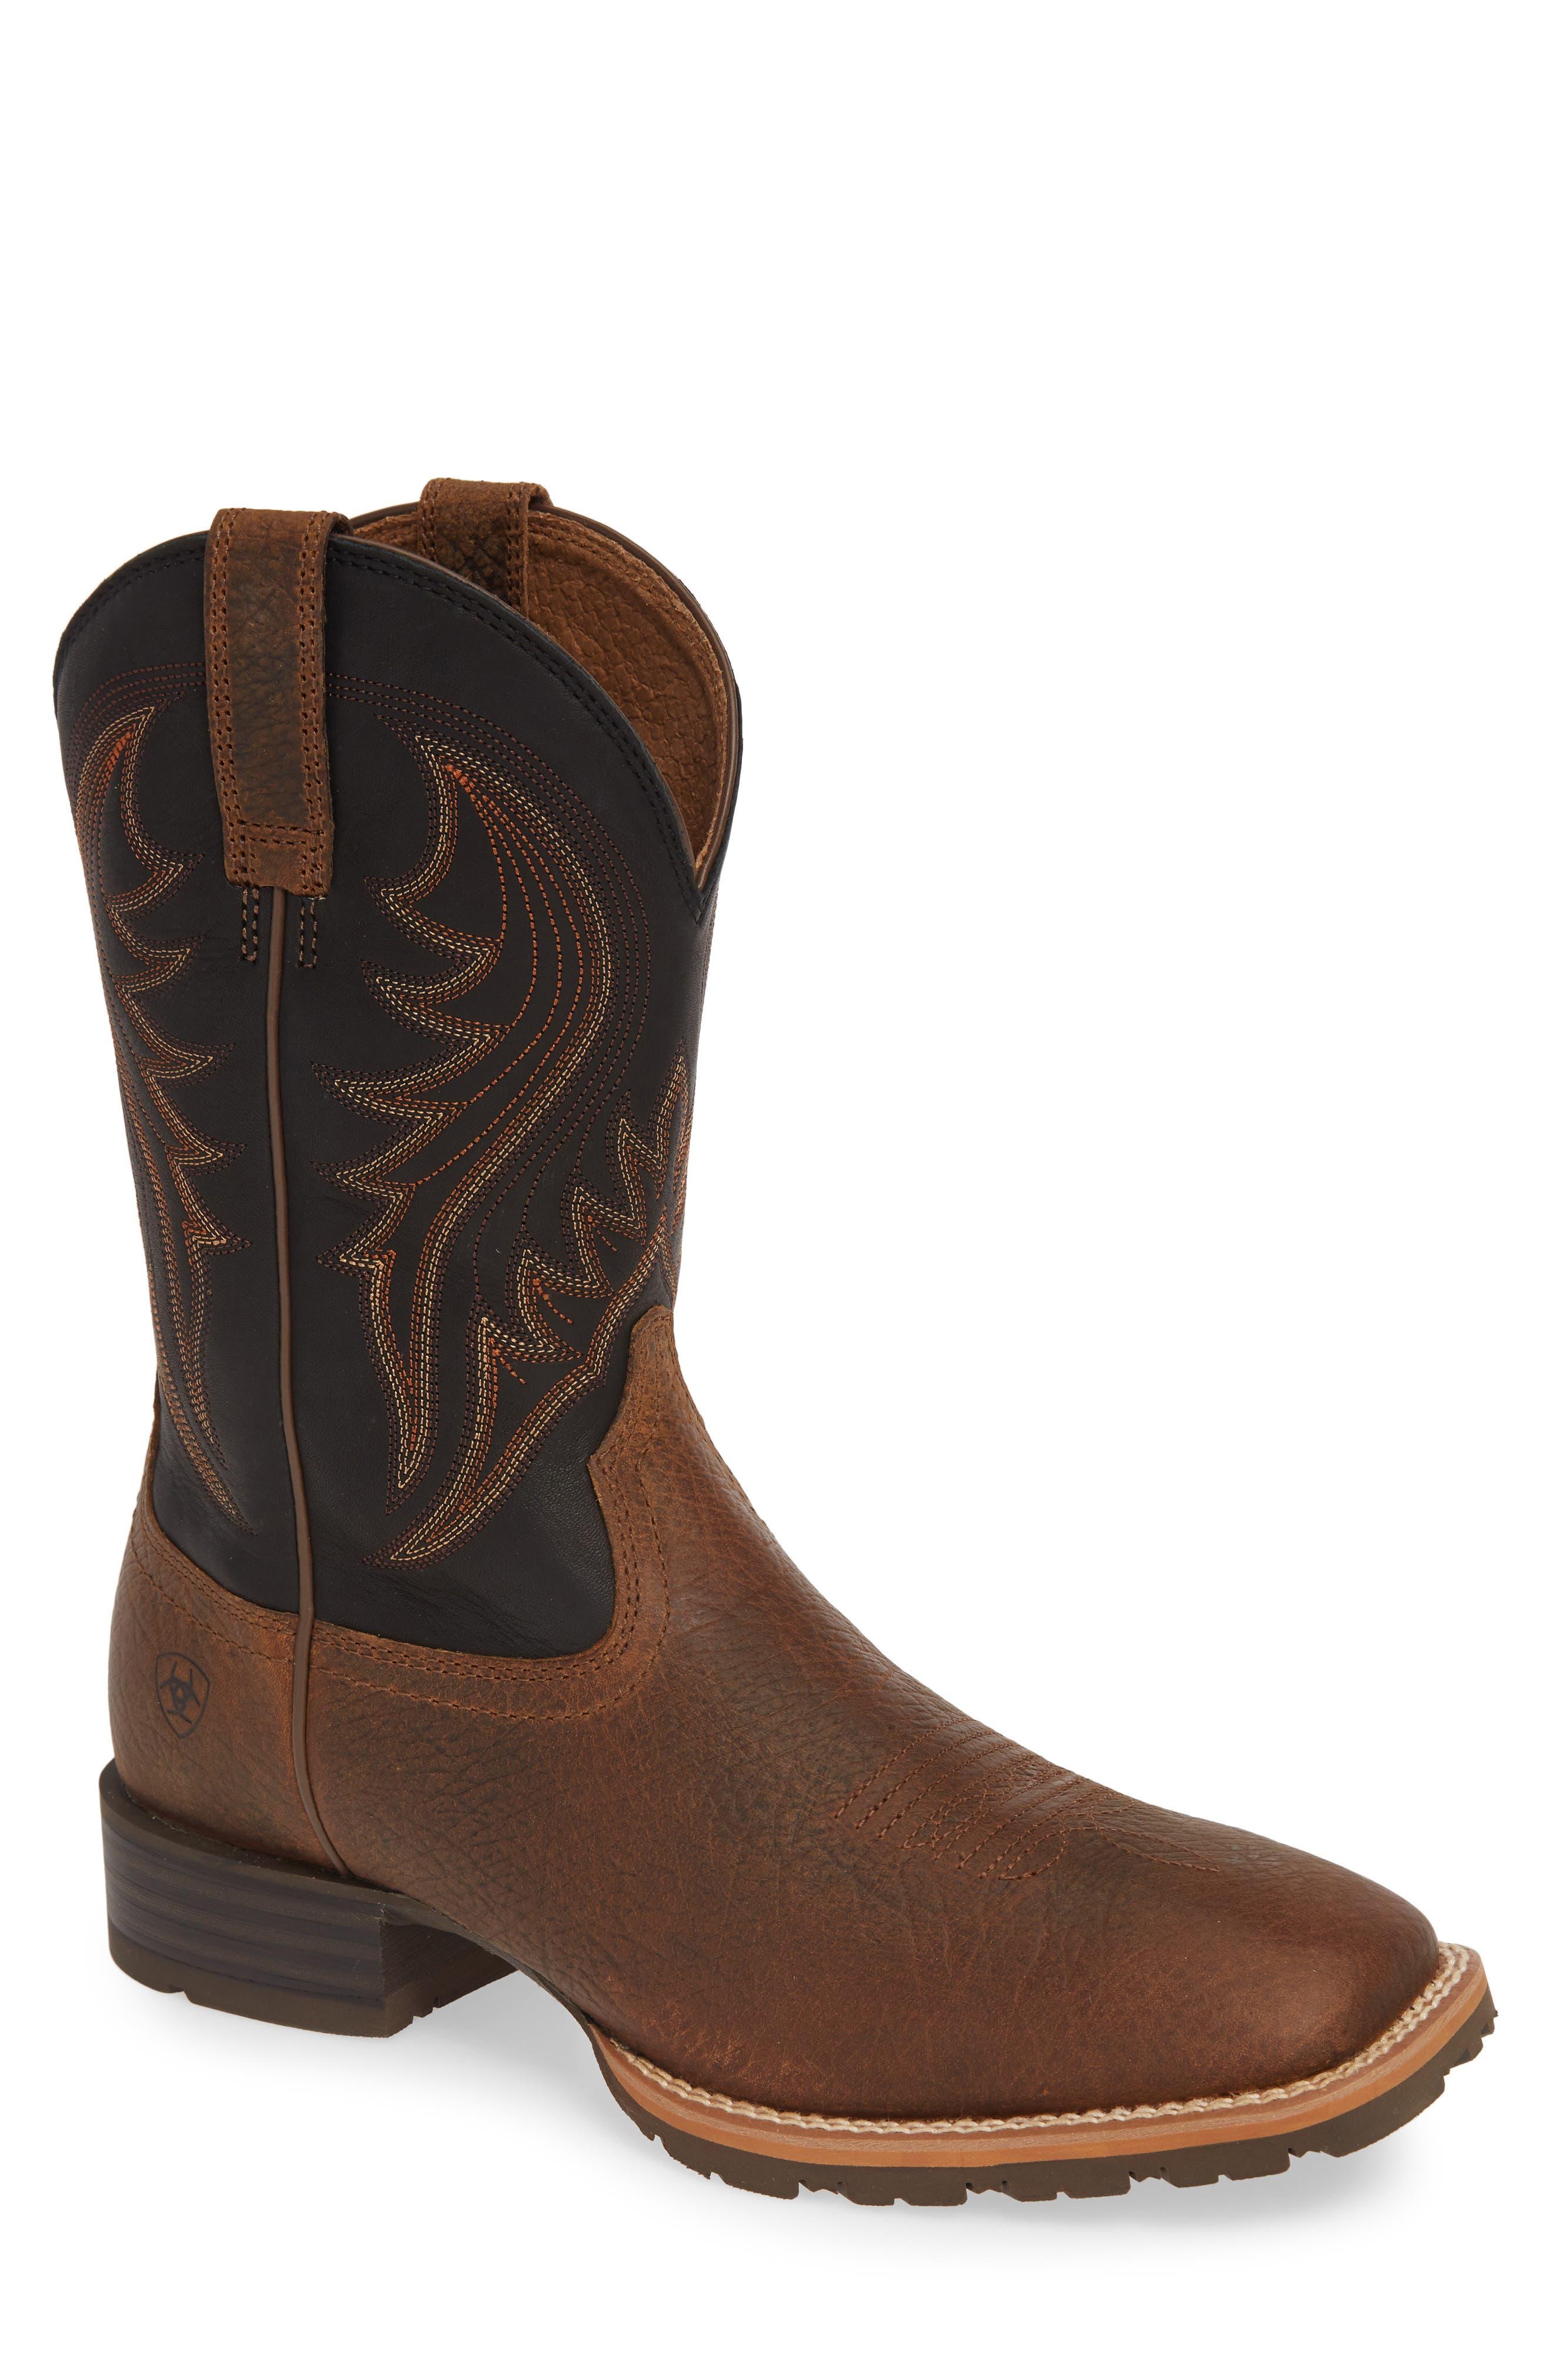 Ariat Hybrid Rancher Cowboy Boot- Brown